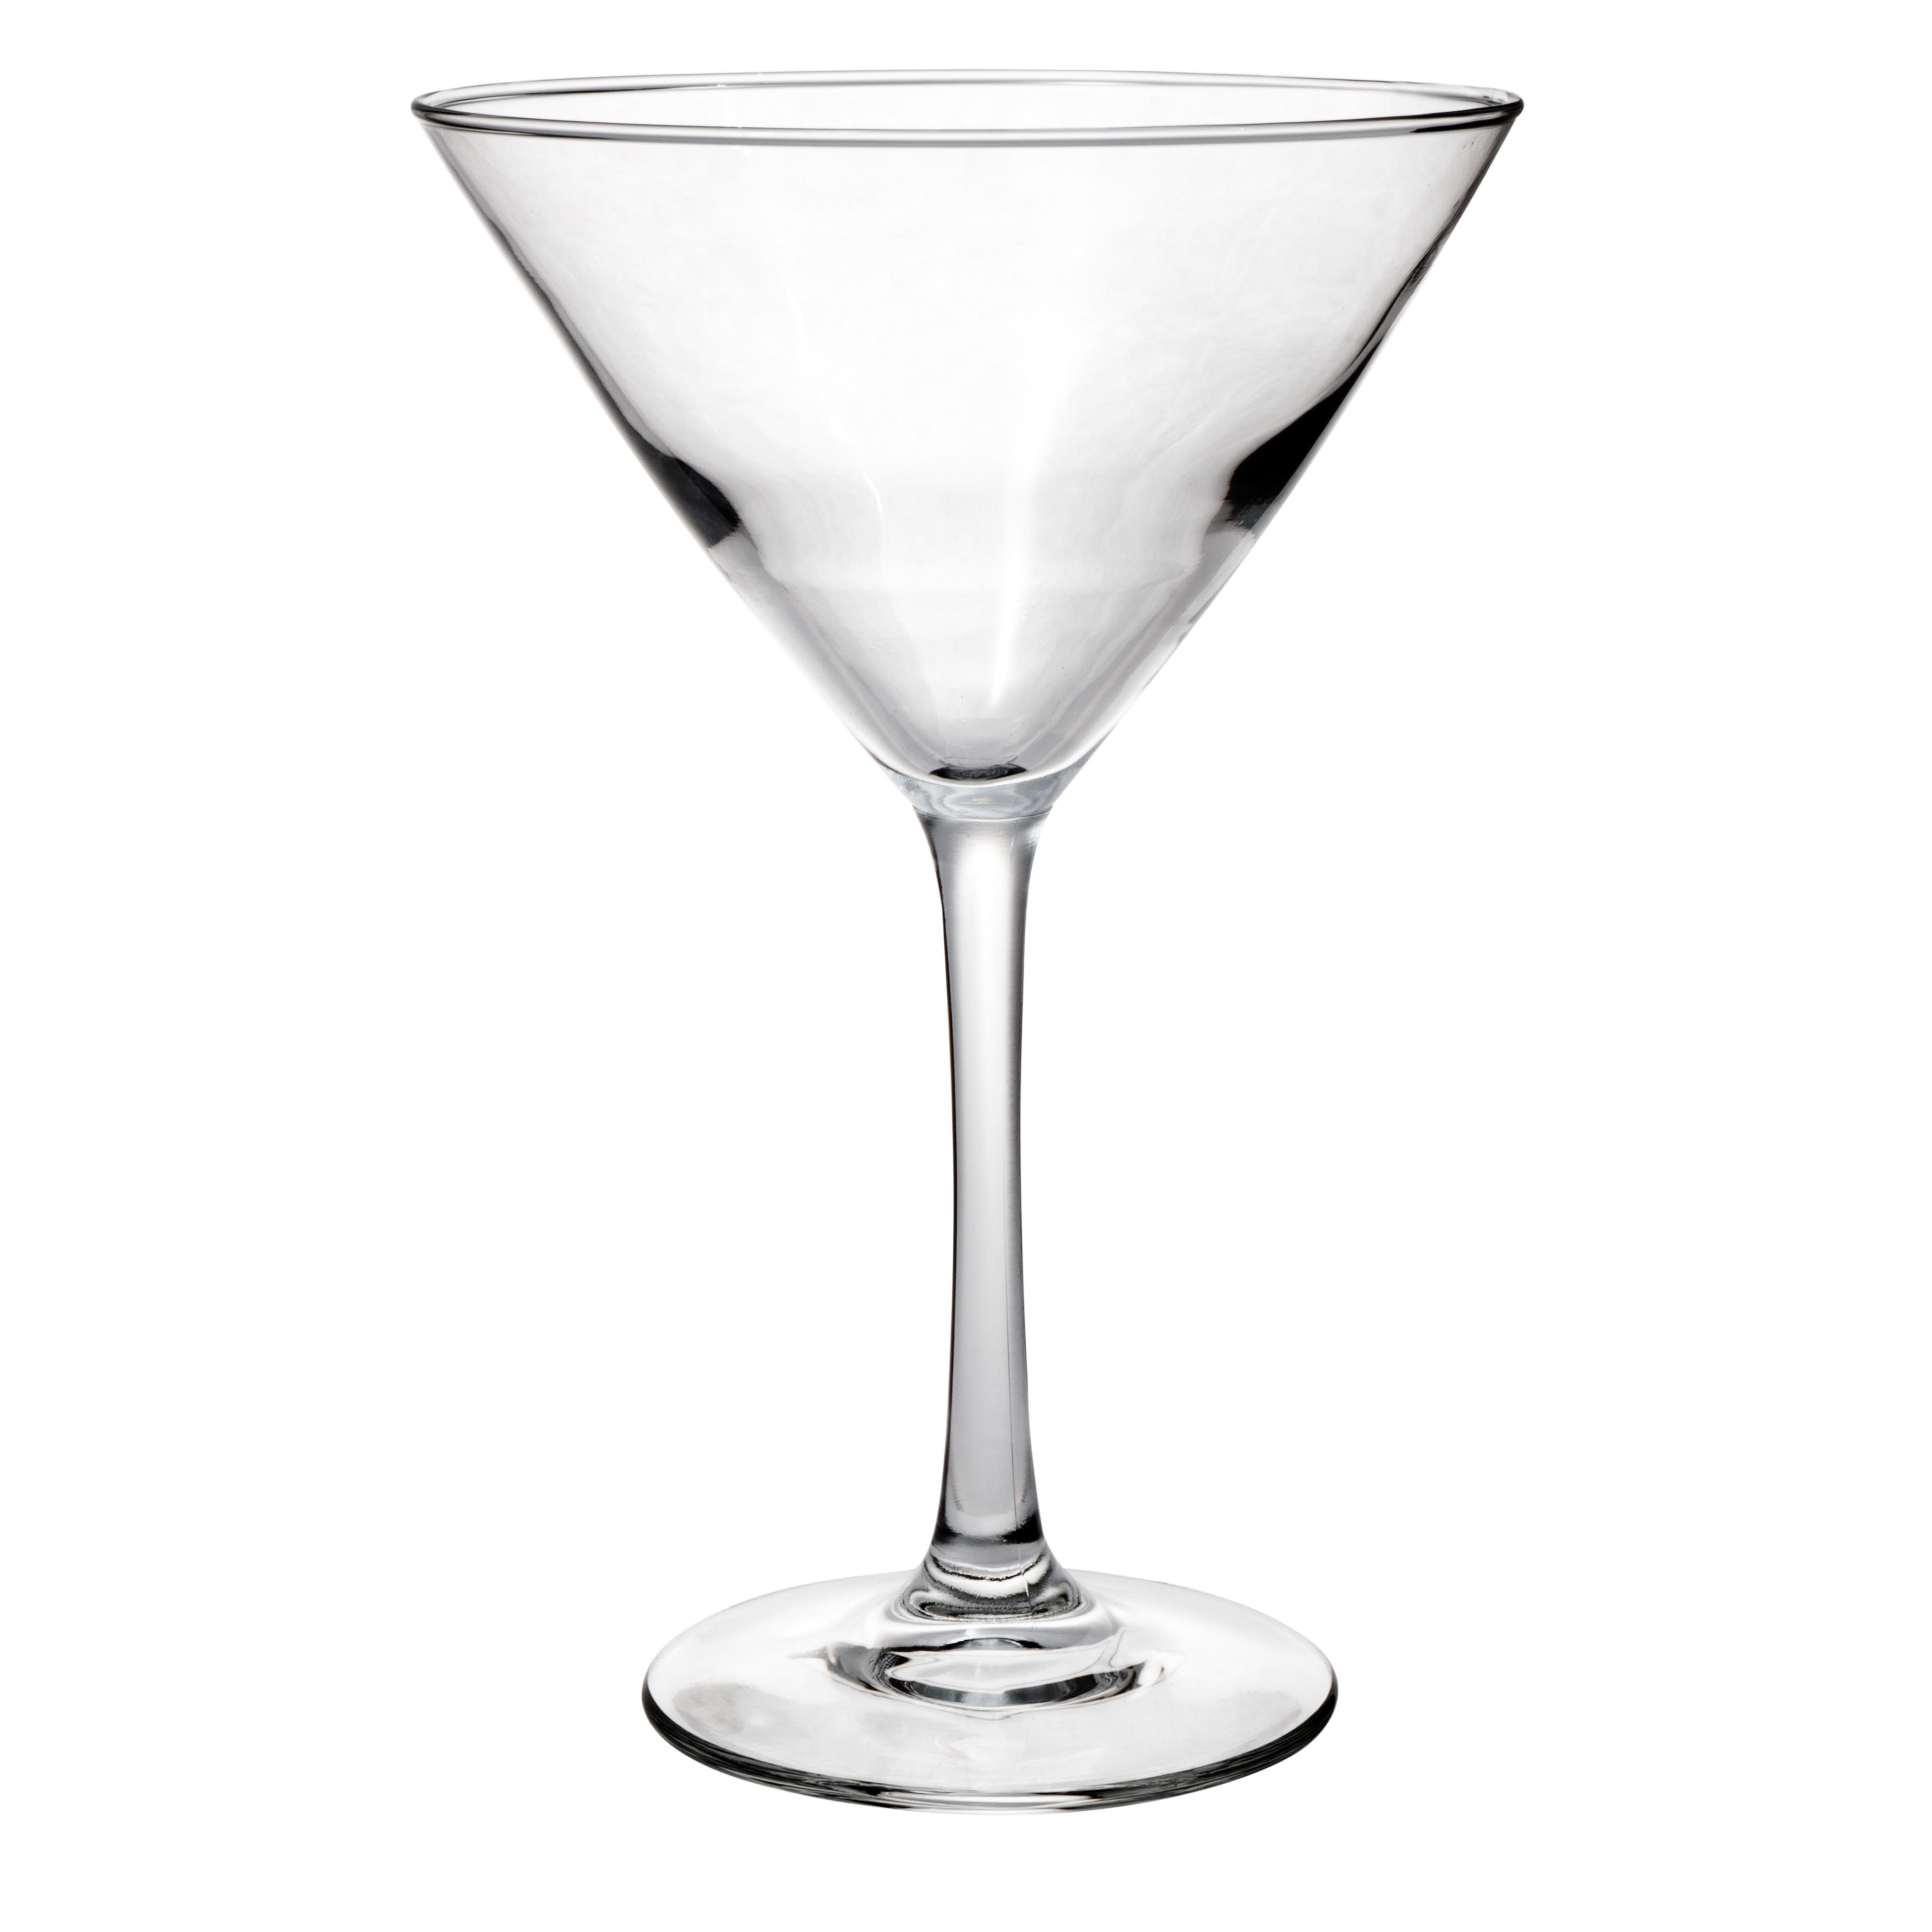 Libbey 7507 12 oz Midtown Martini Glass - Finedge & Safedge Rim